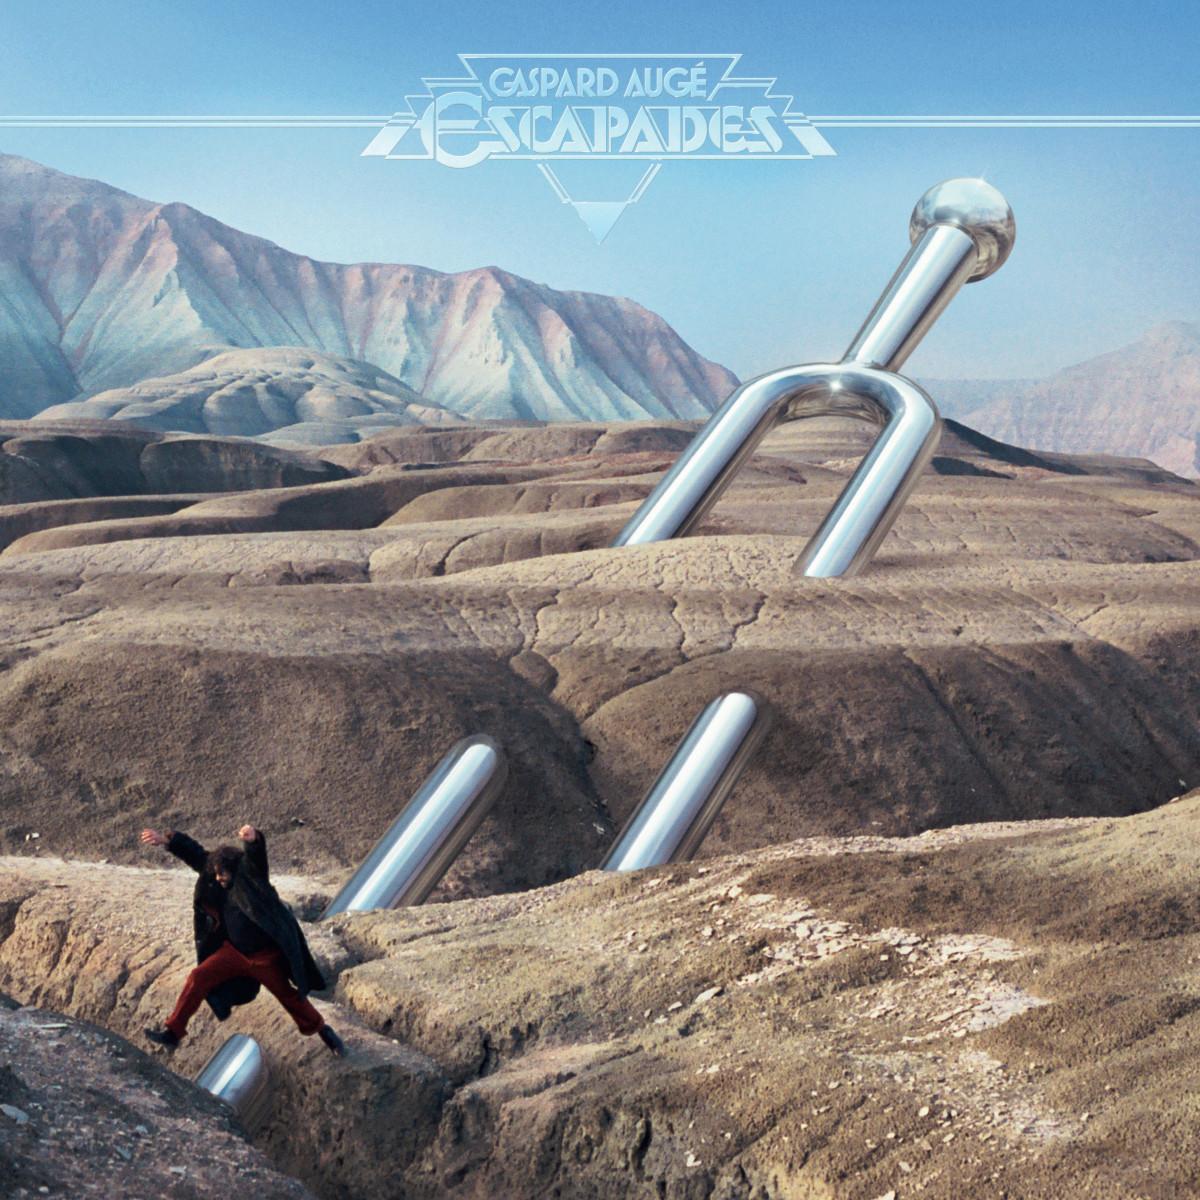 Gaspard Augé Escapades Cover Art